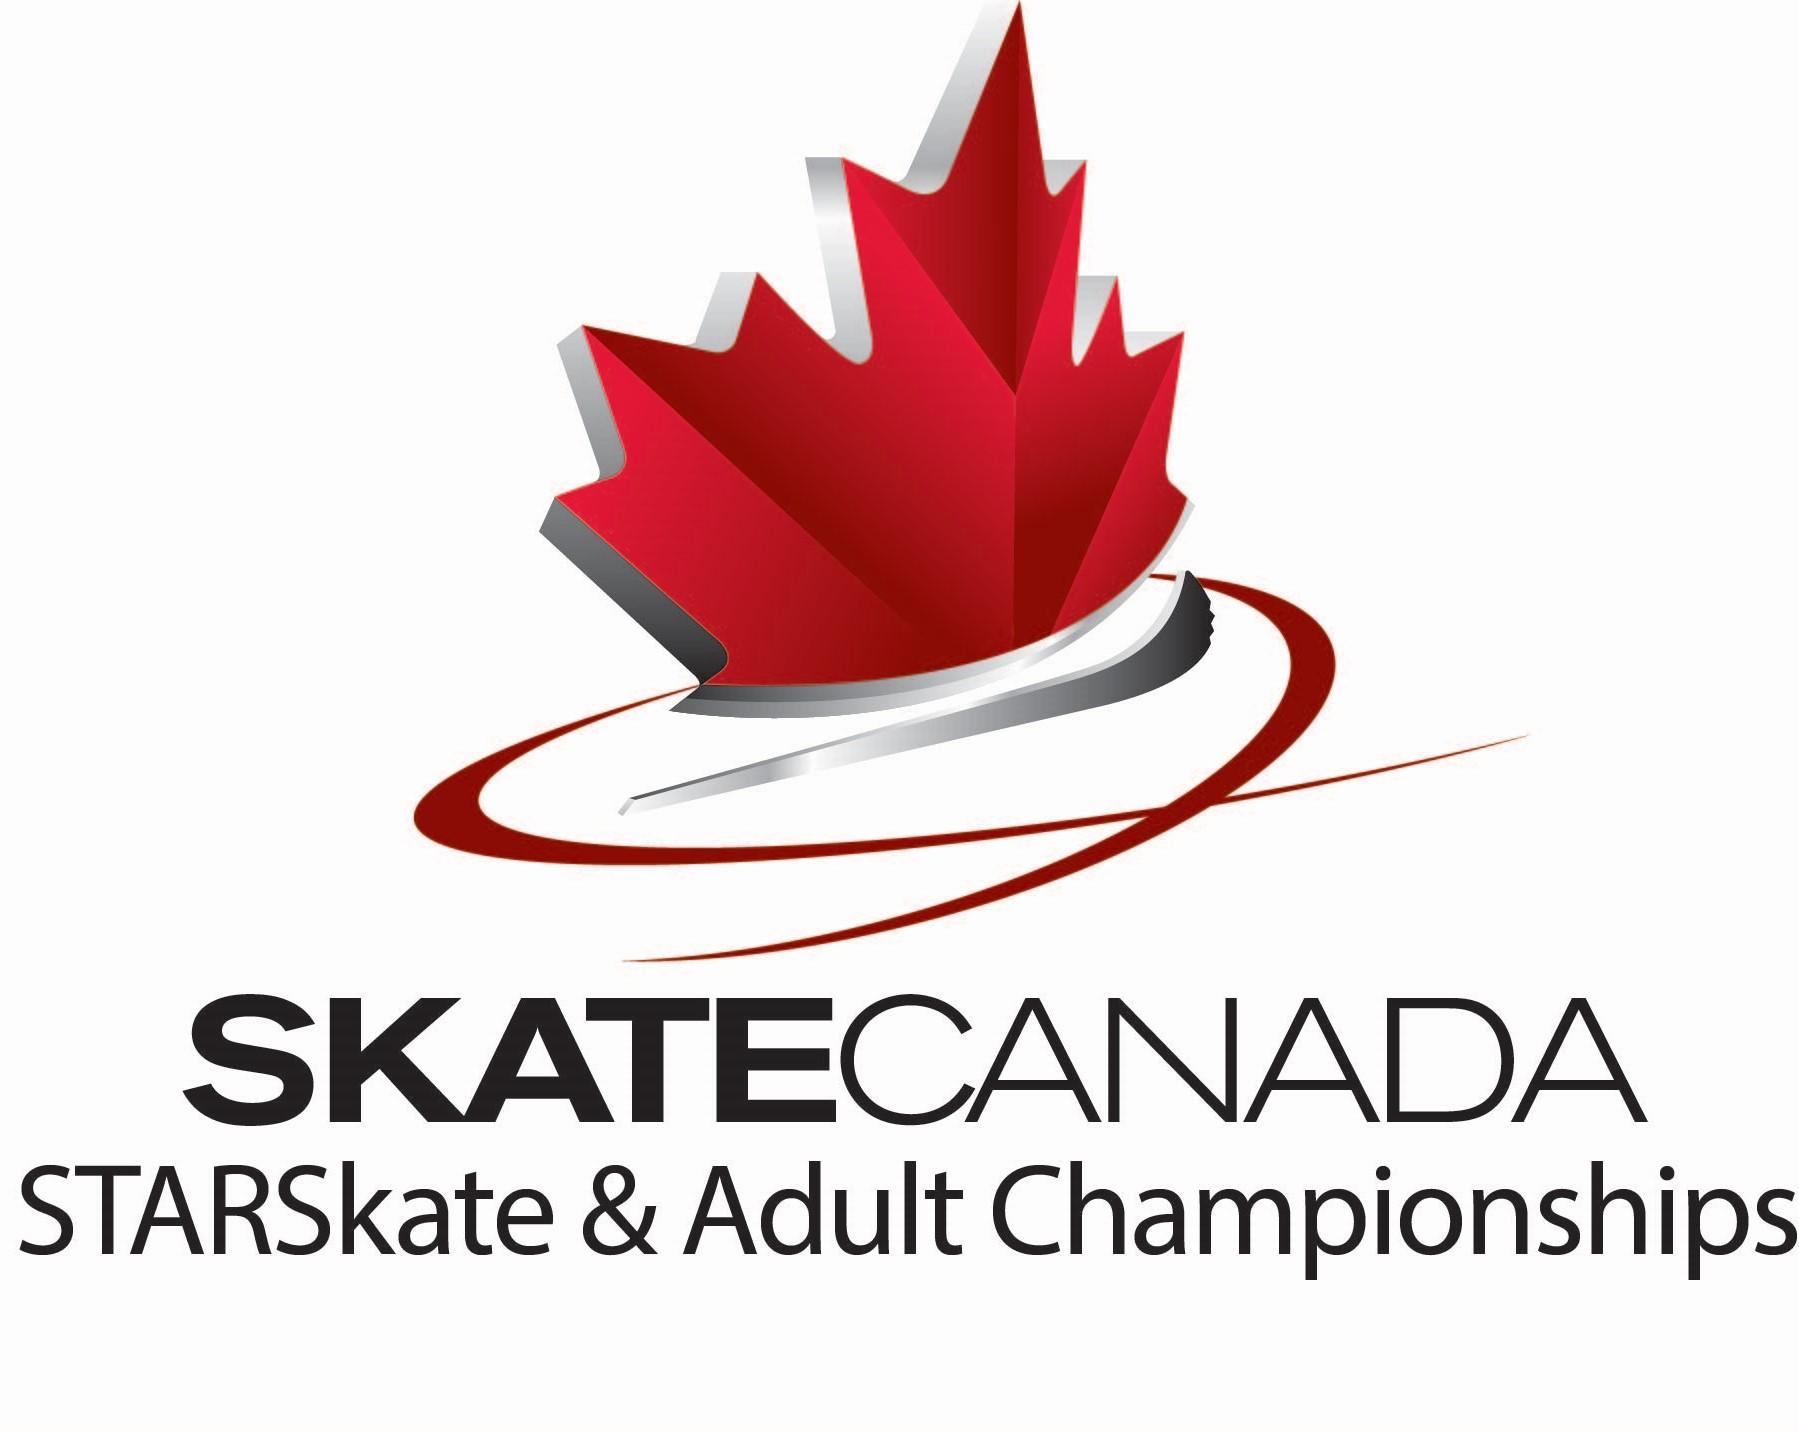 Skate-Canada-STARSkate-Championships-1